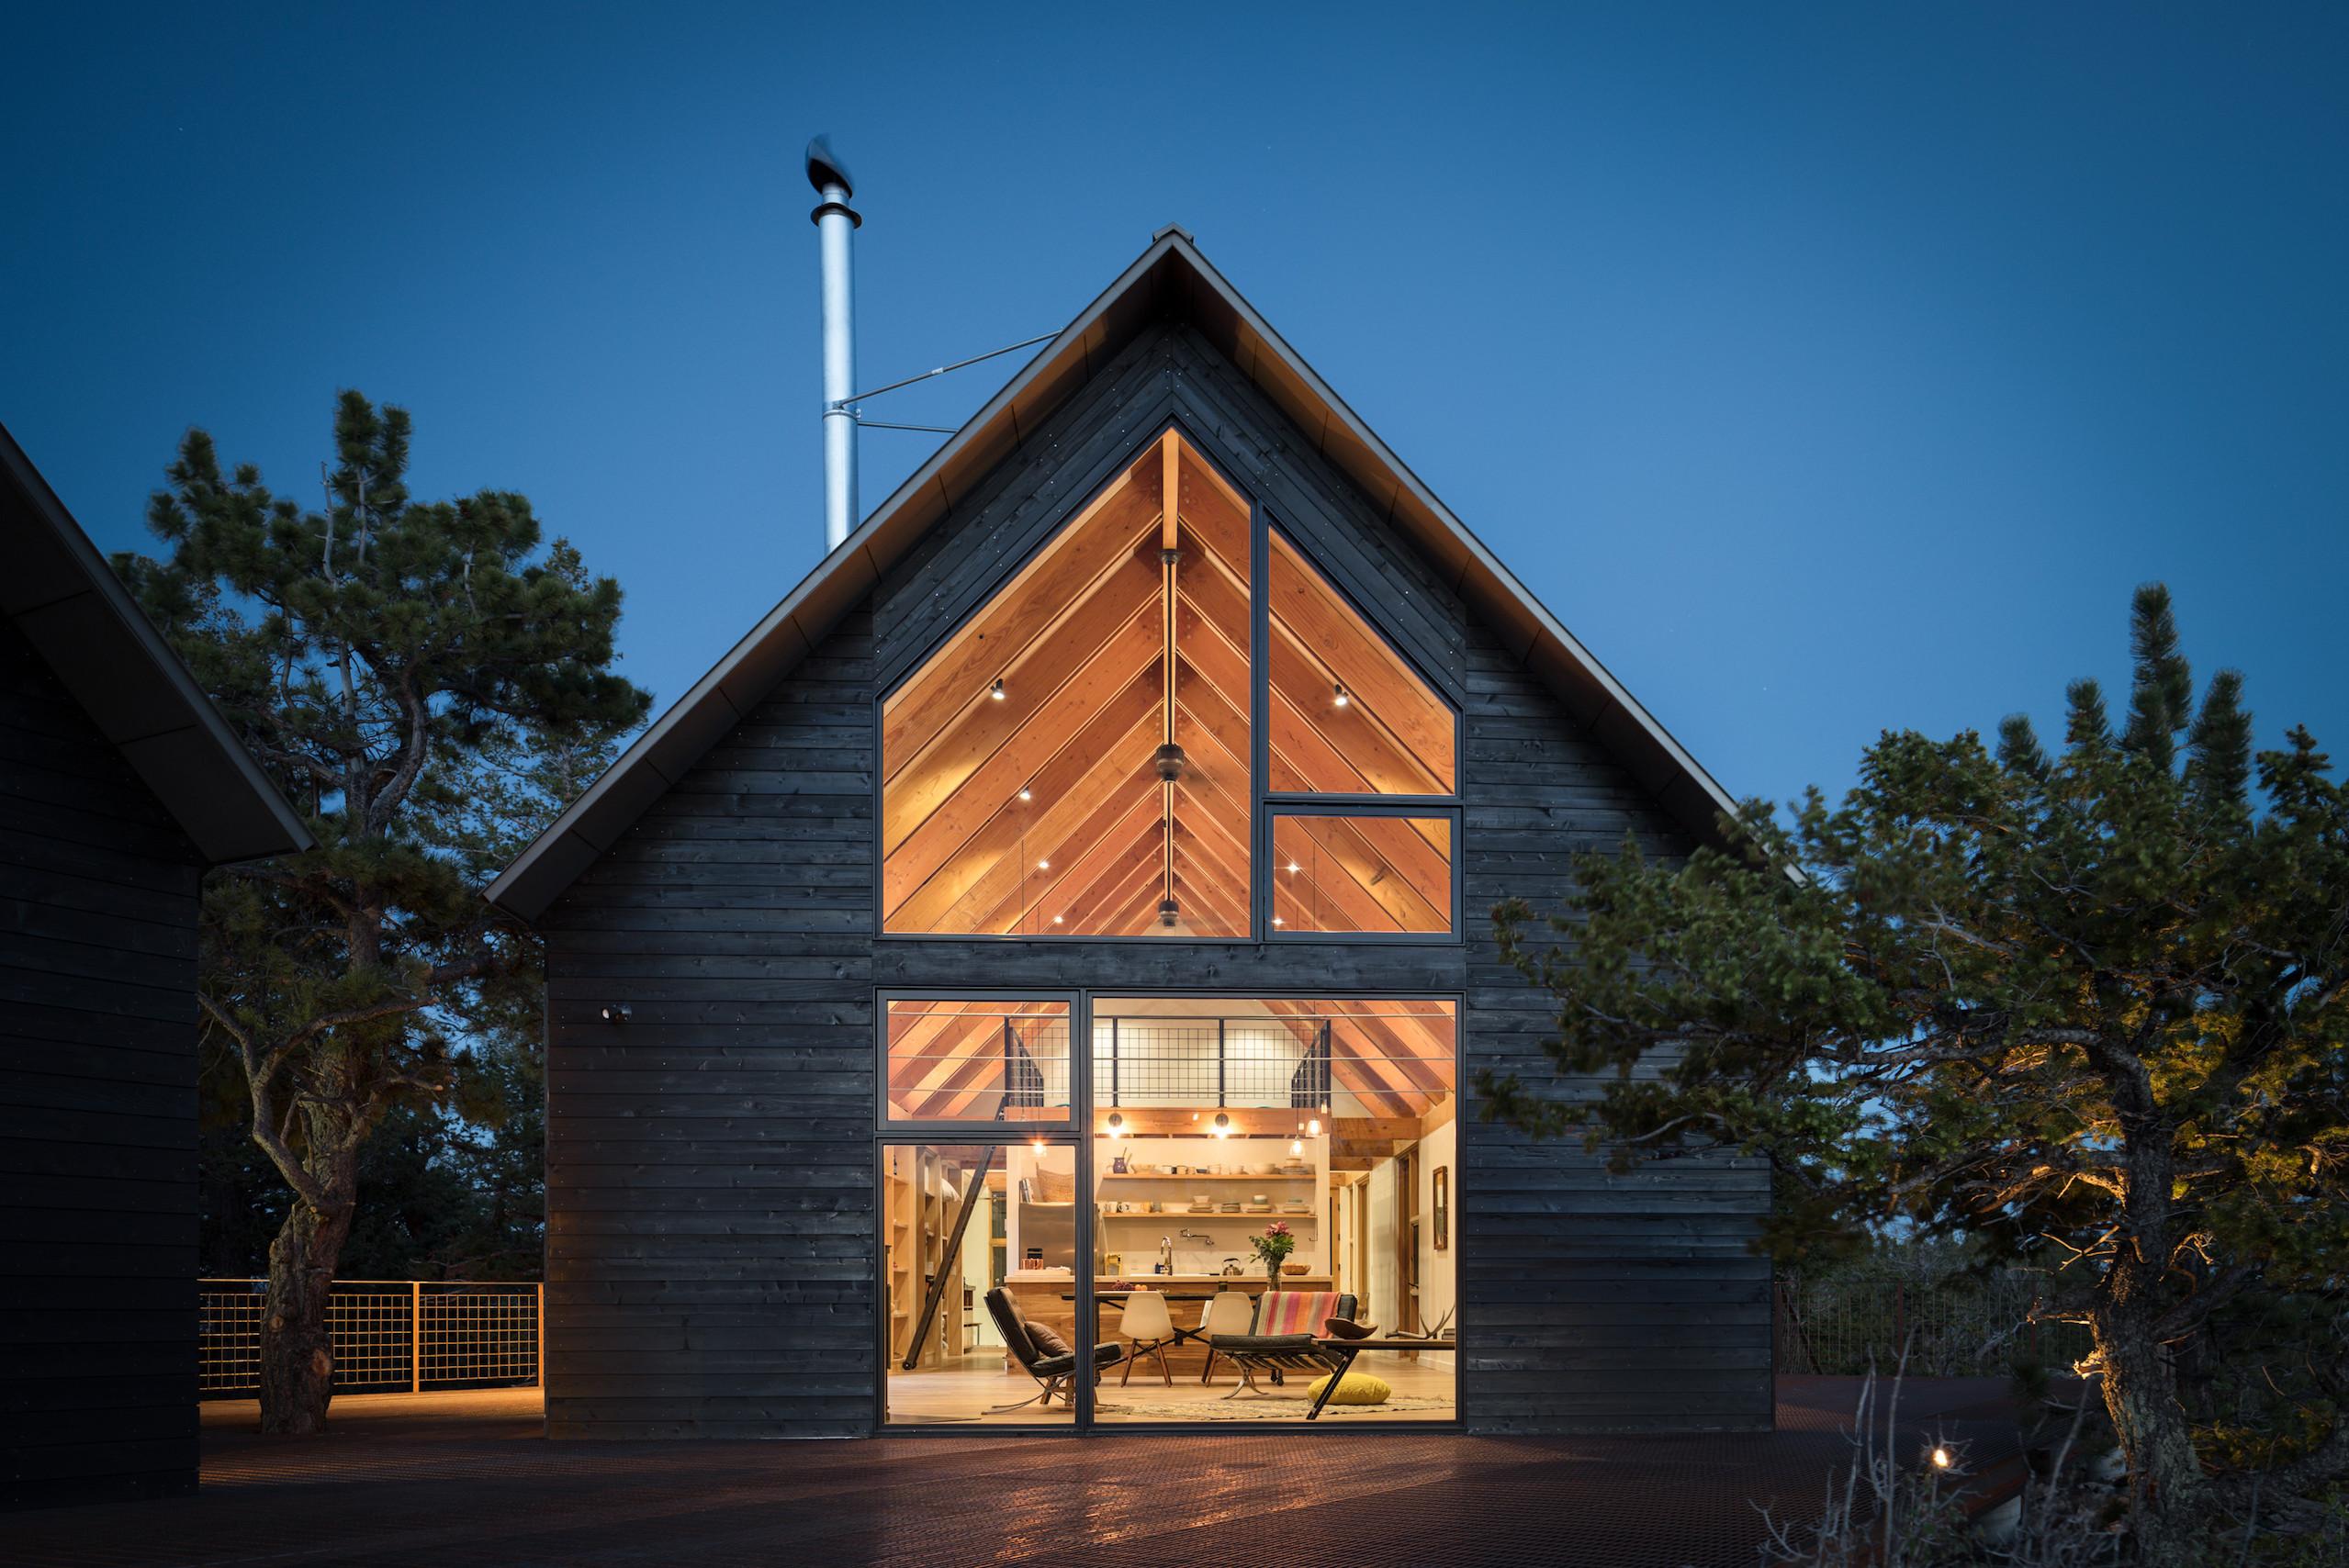 Twilight at Big Cabin | Little Cabin by Renée del Gaudio Architecture.